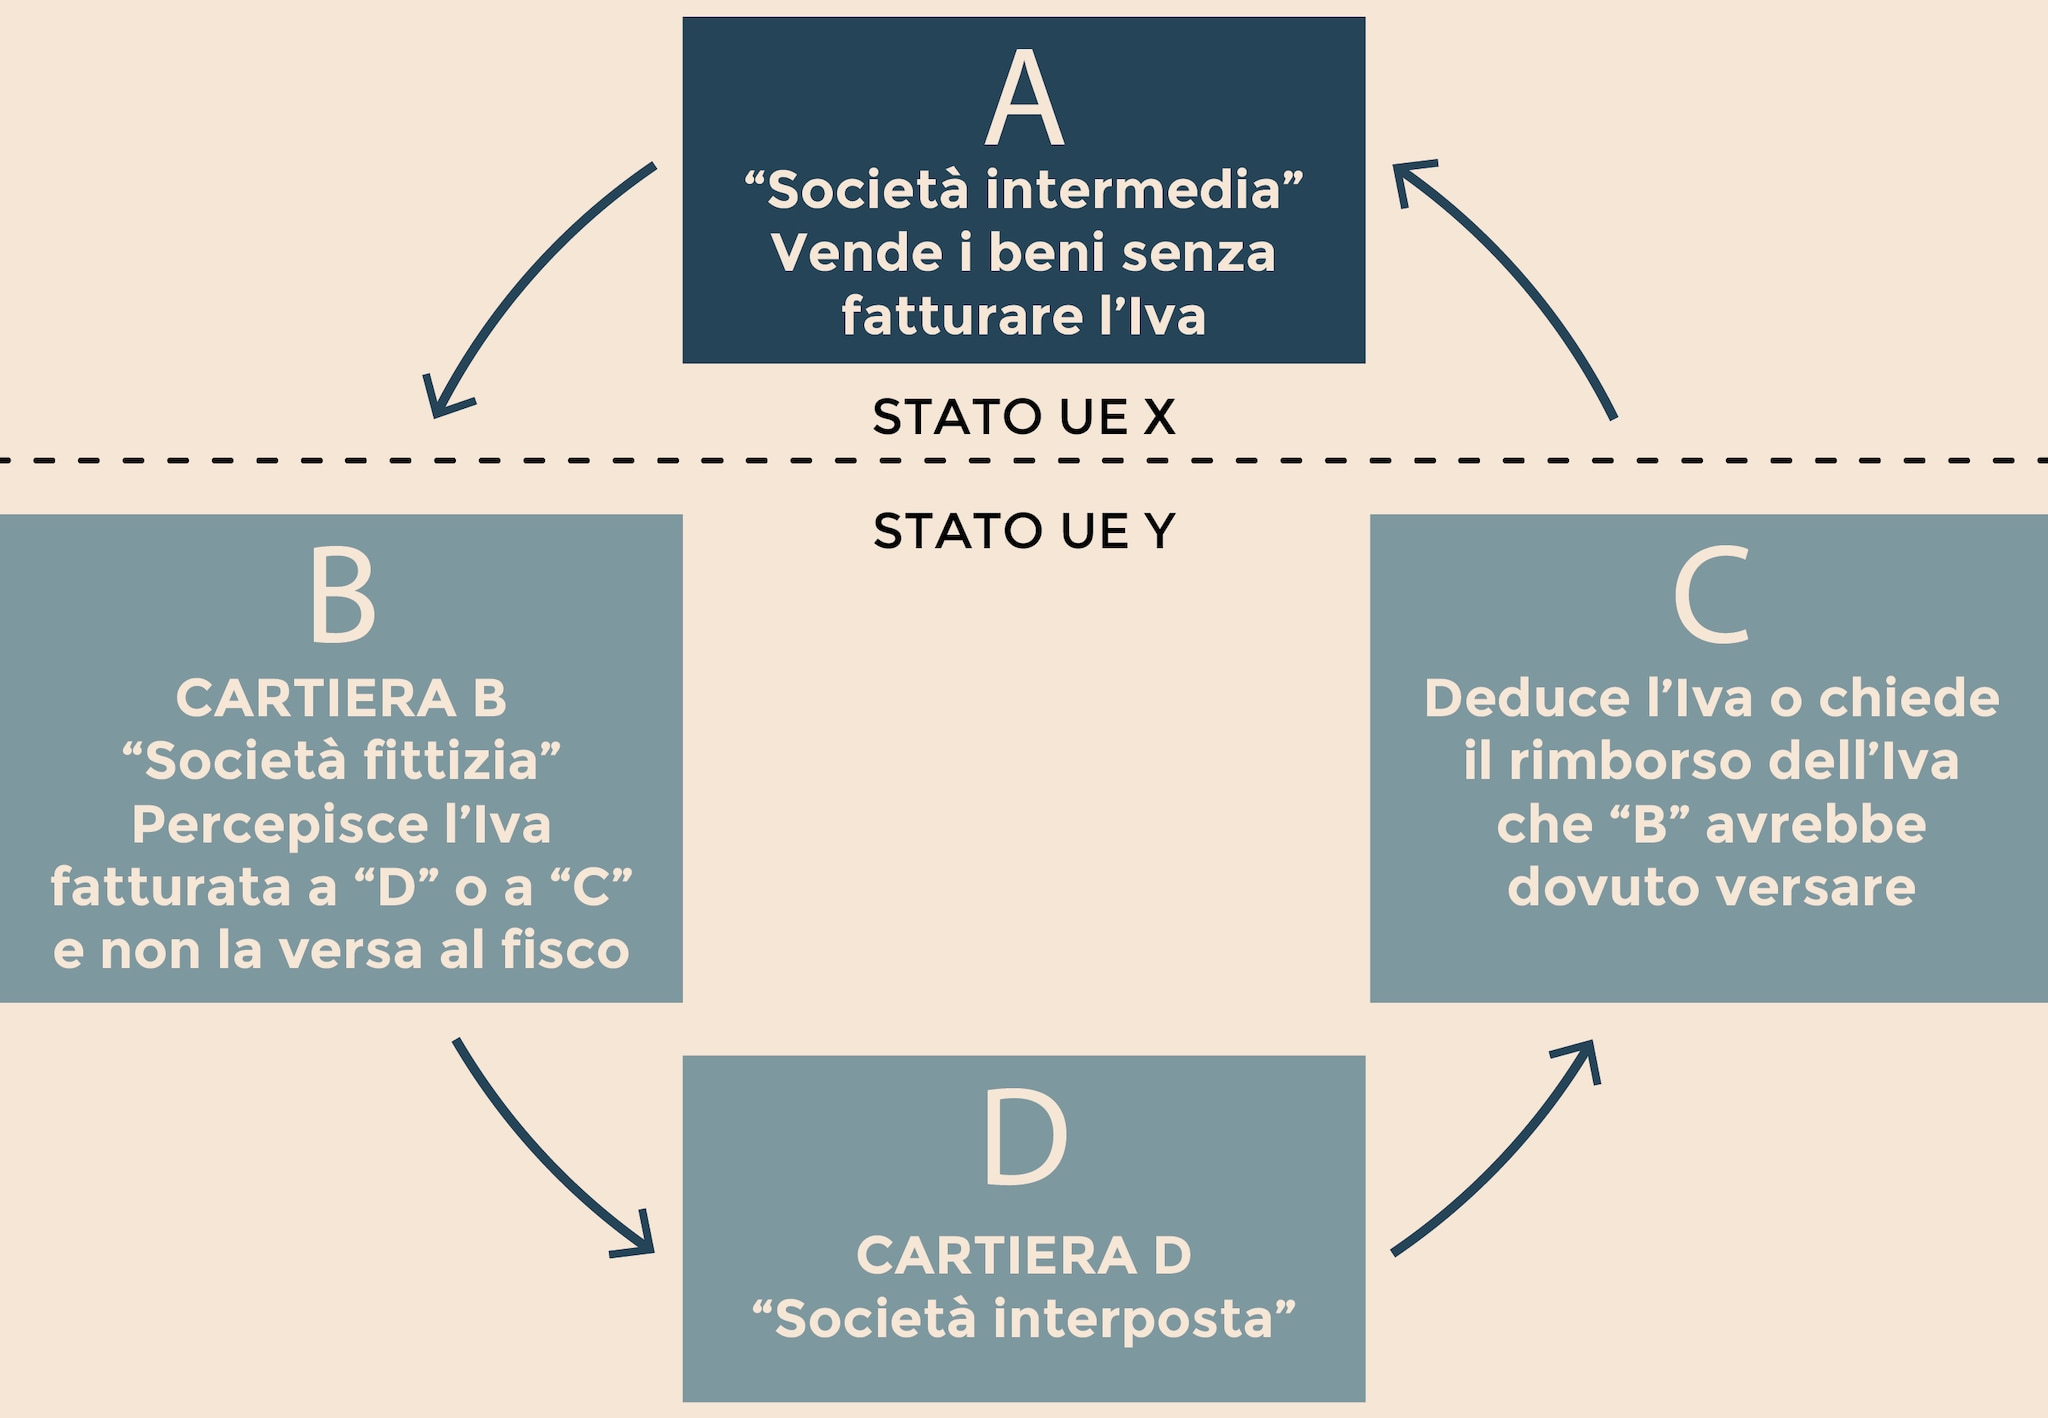 COSÌ GIRA LA FRODE CAROSELLO